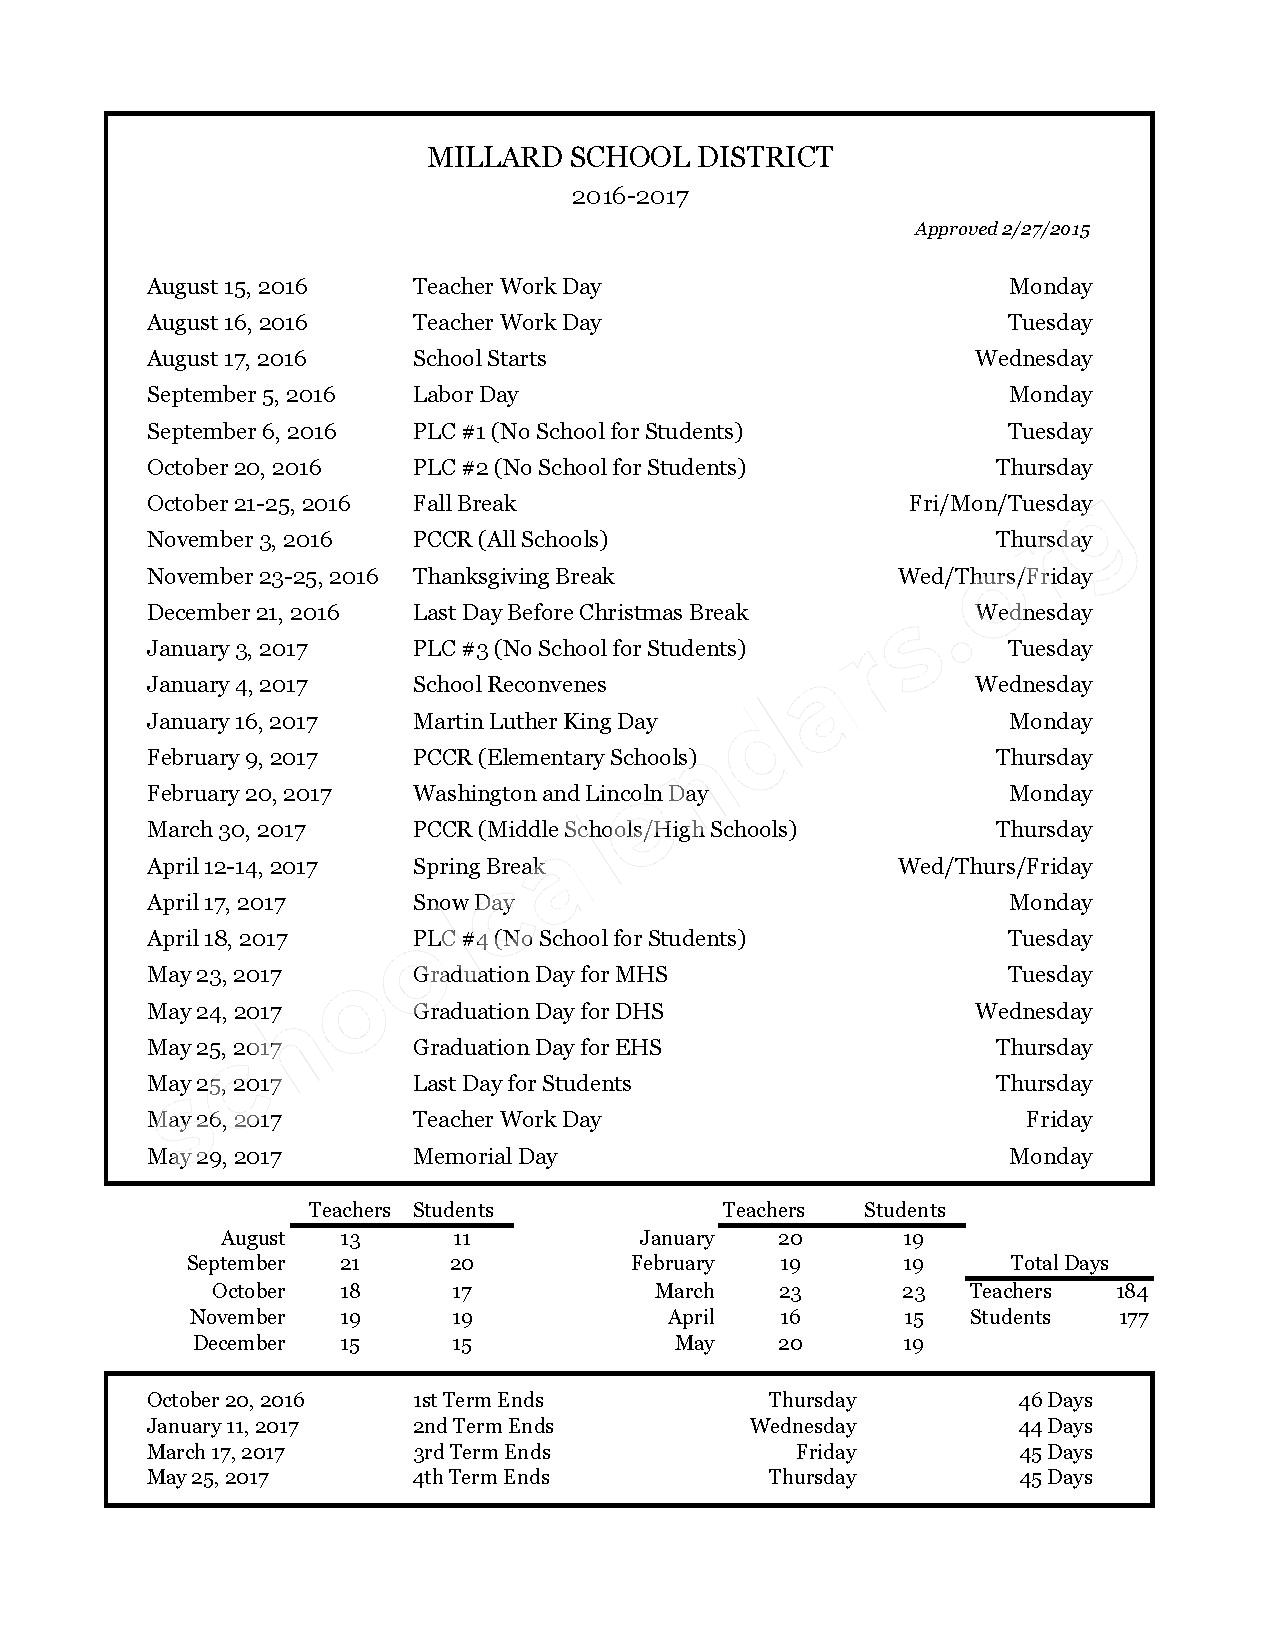 2016 - 2017 Holiday Calendar – Millard School District – page 1